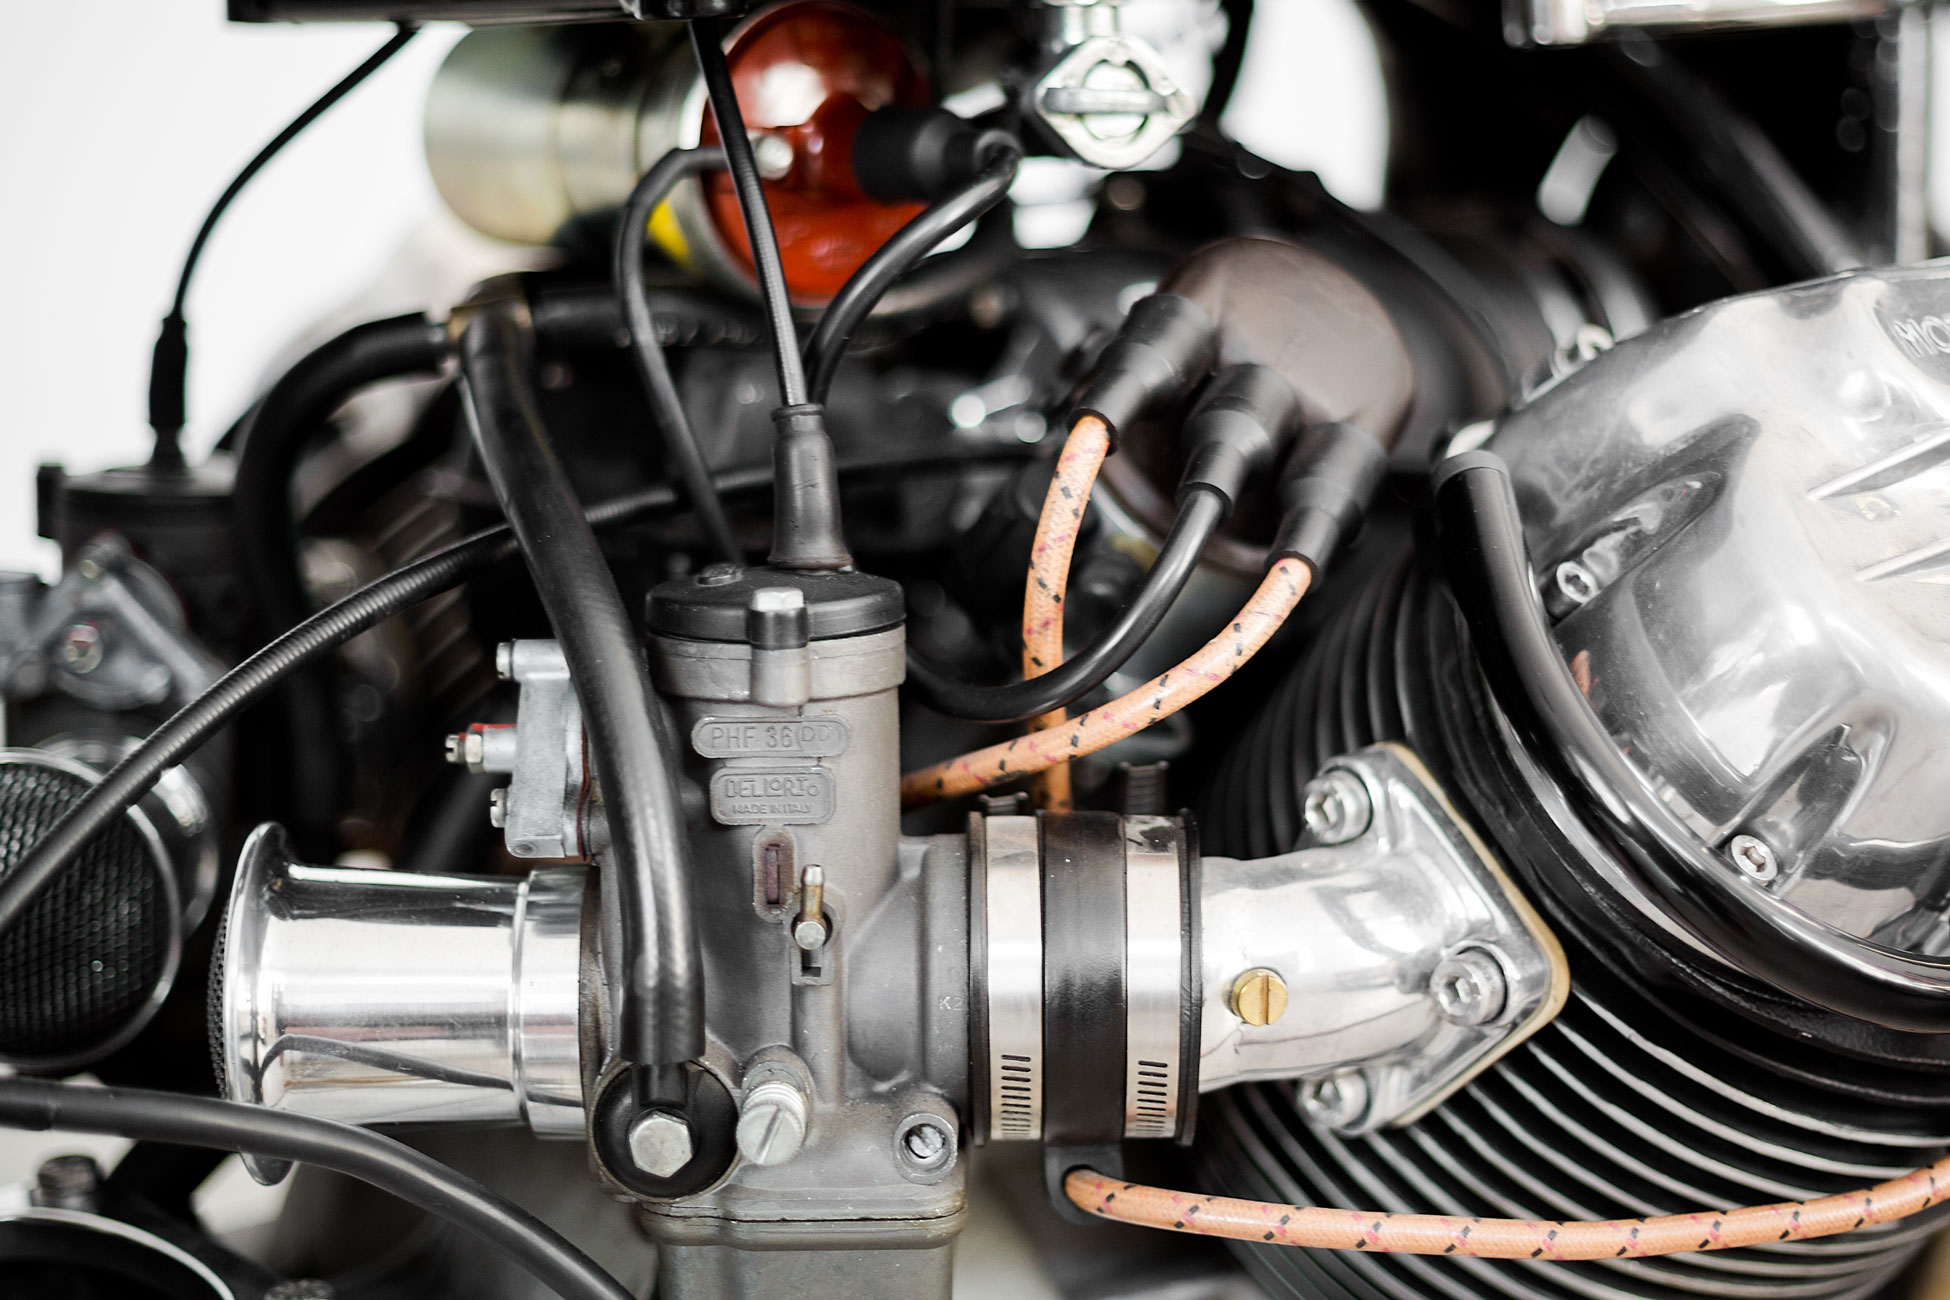 Route Fiere, vintage Moto Guzzi V7 carburetor